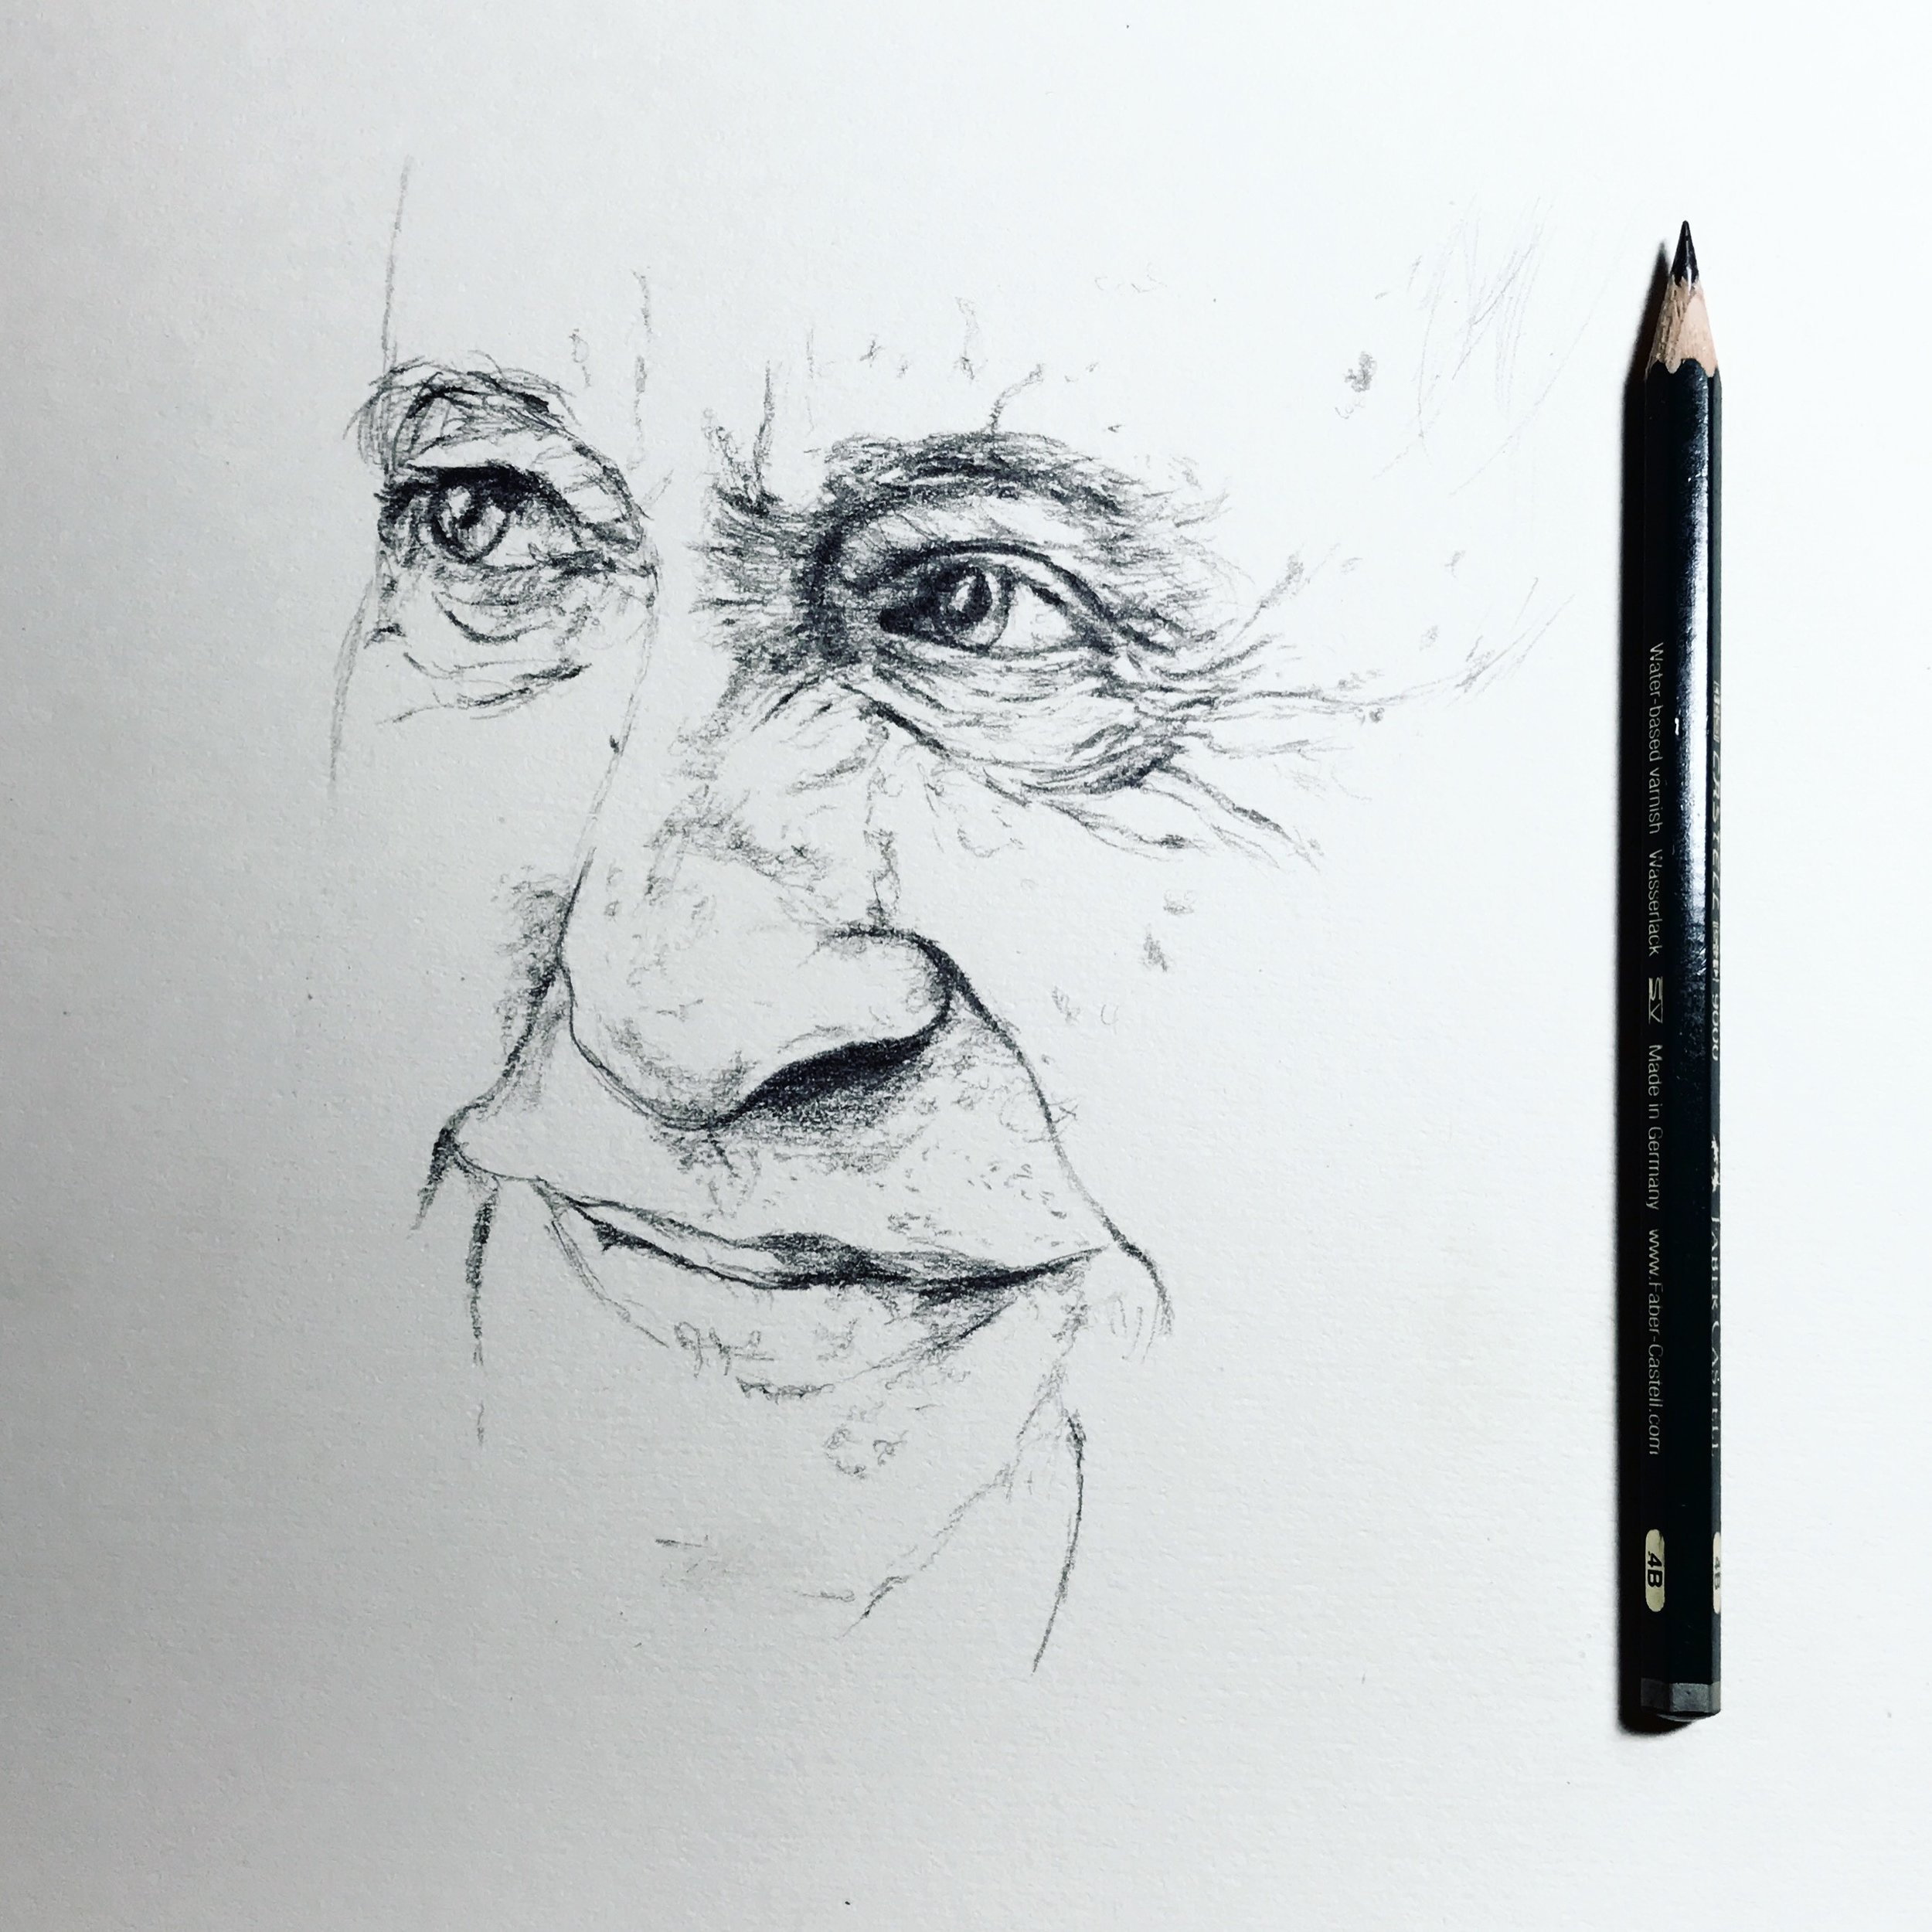 qustom portrait